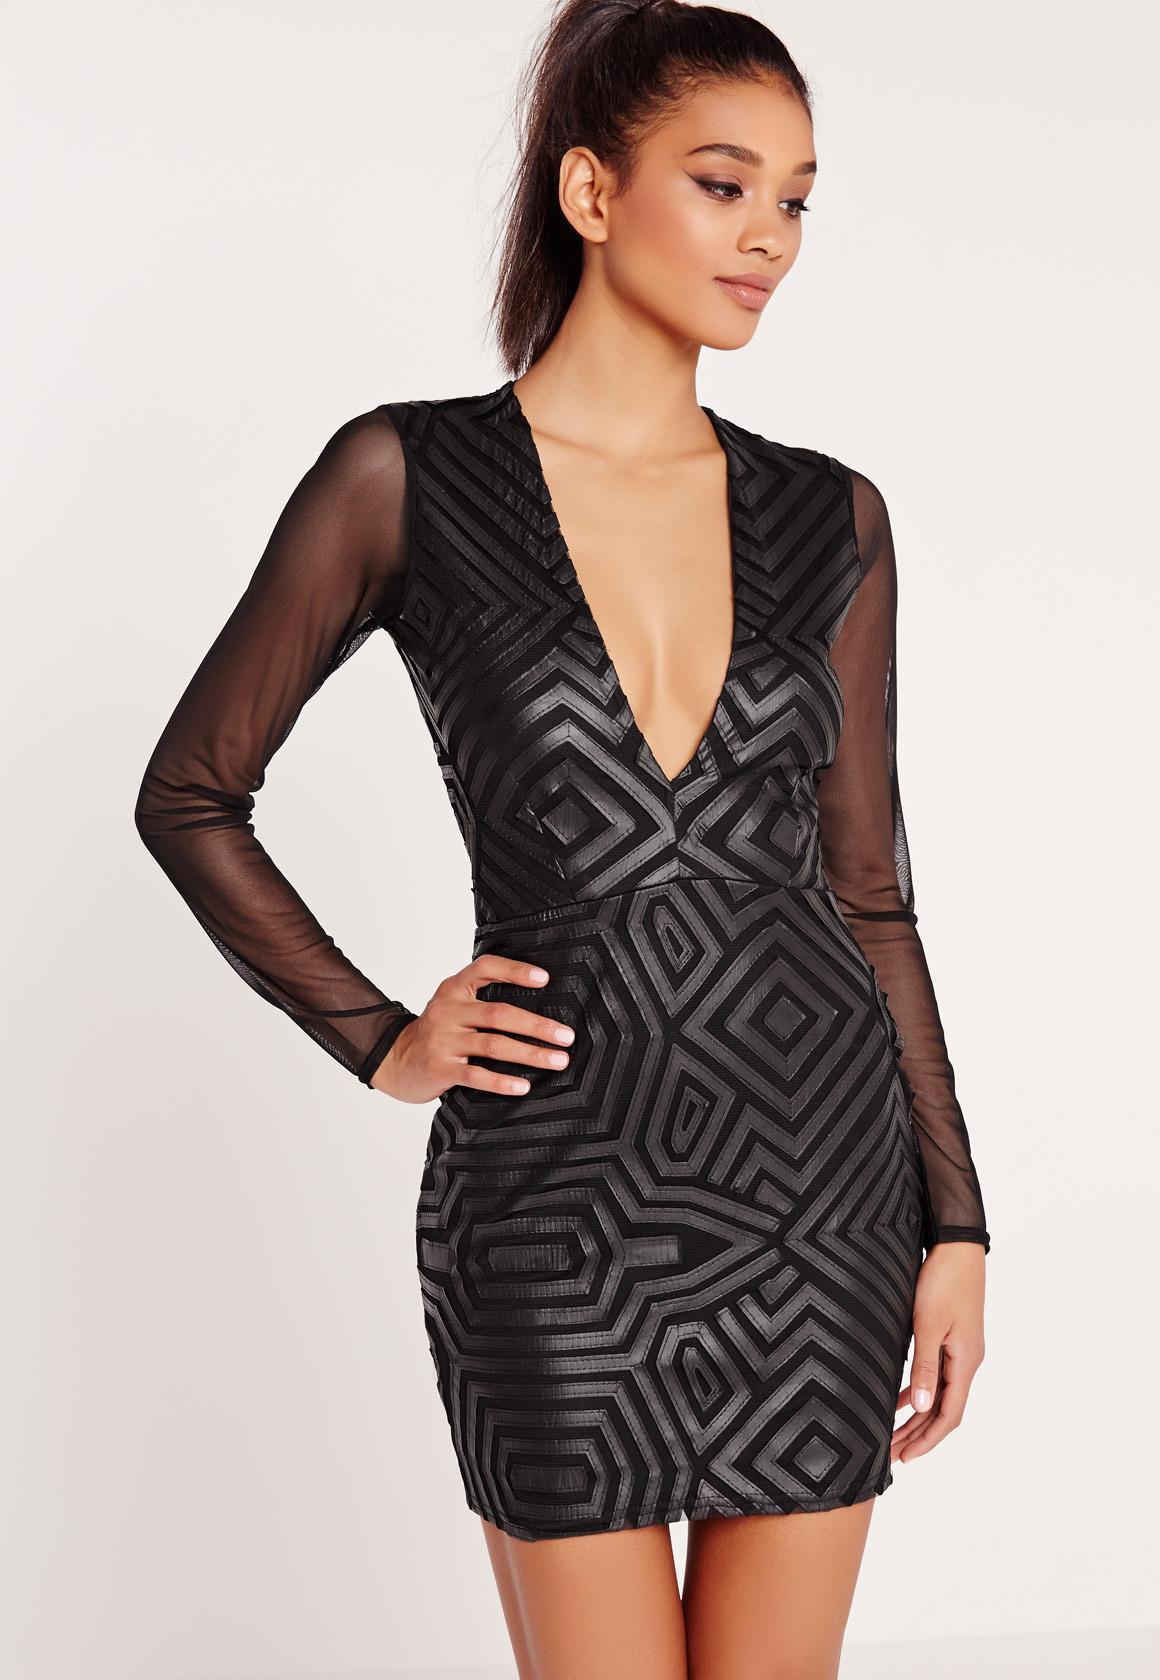 Black faux leather like dress